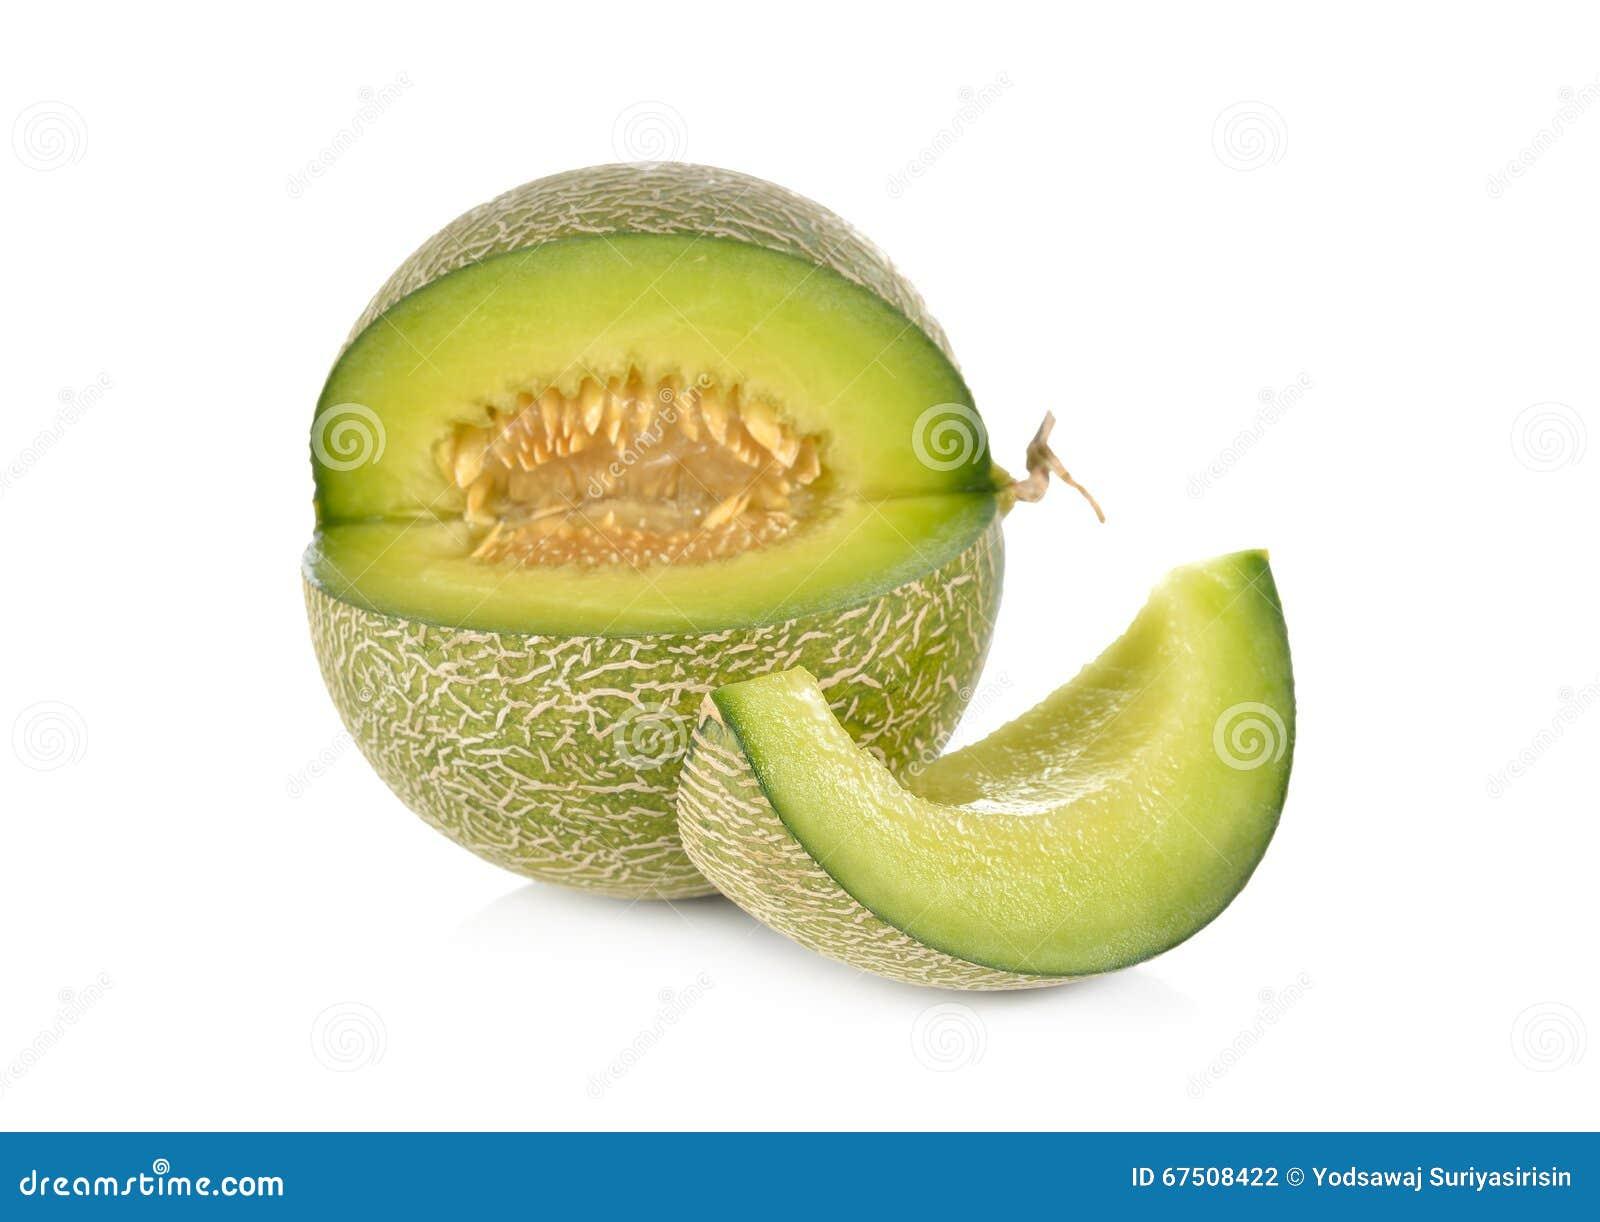 how to cut honeydew watermelon